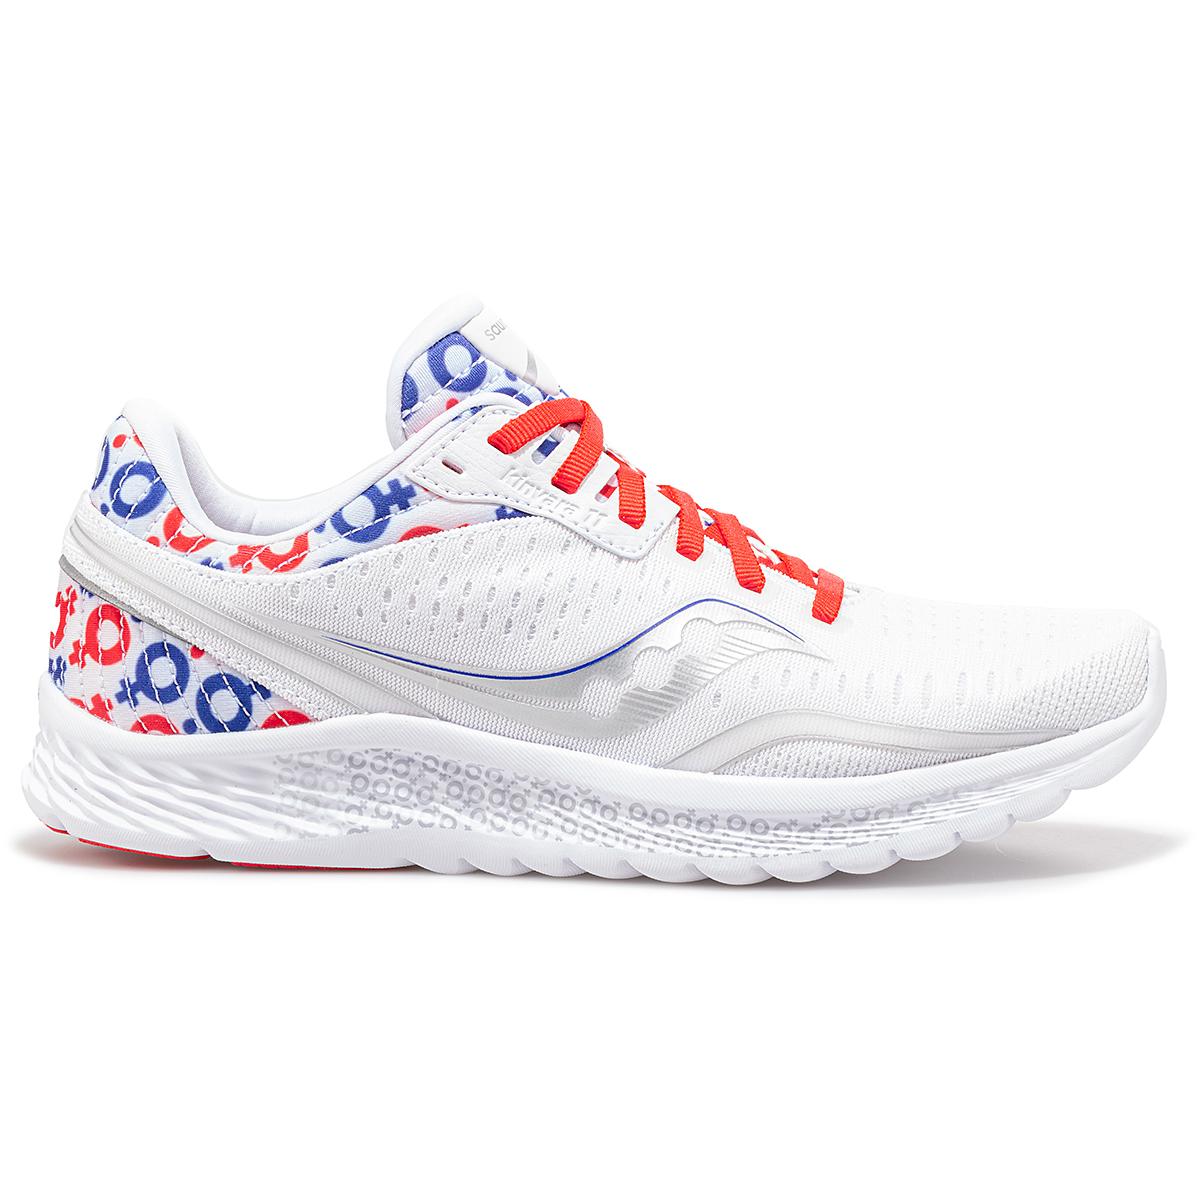 Men's Saucony x Prinkshop Hero Kinvara 11 Running Shoe - Color: Red/White/Blue - Size: 7 - Width: Regular, Red/White/Blue, large, image 1